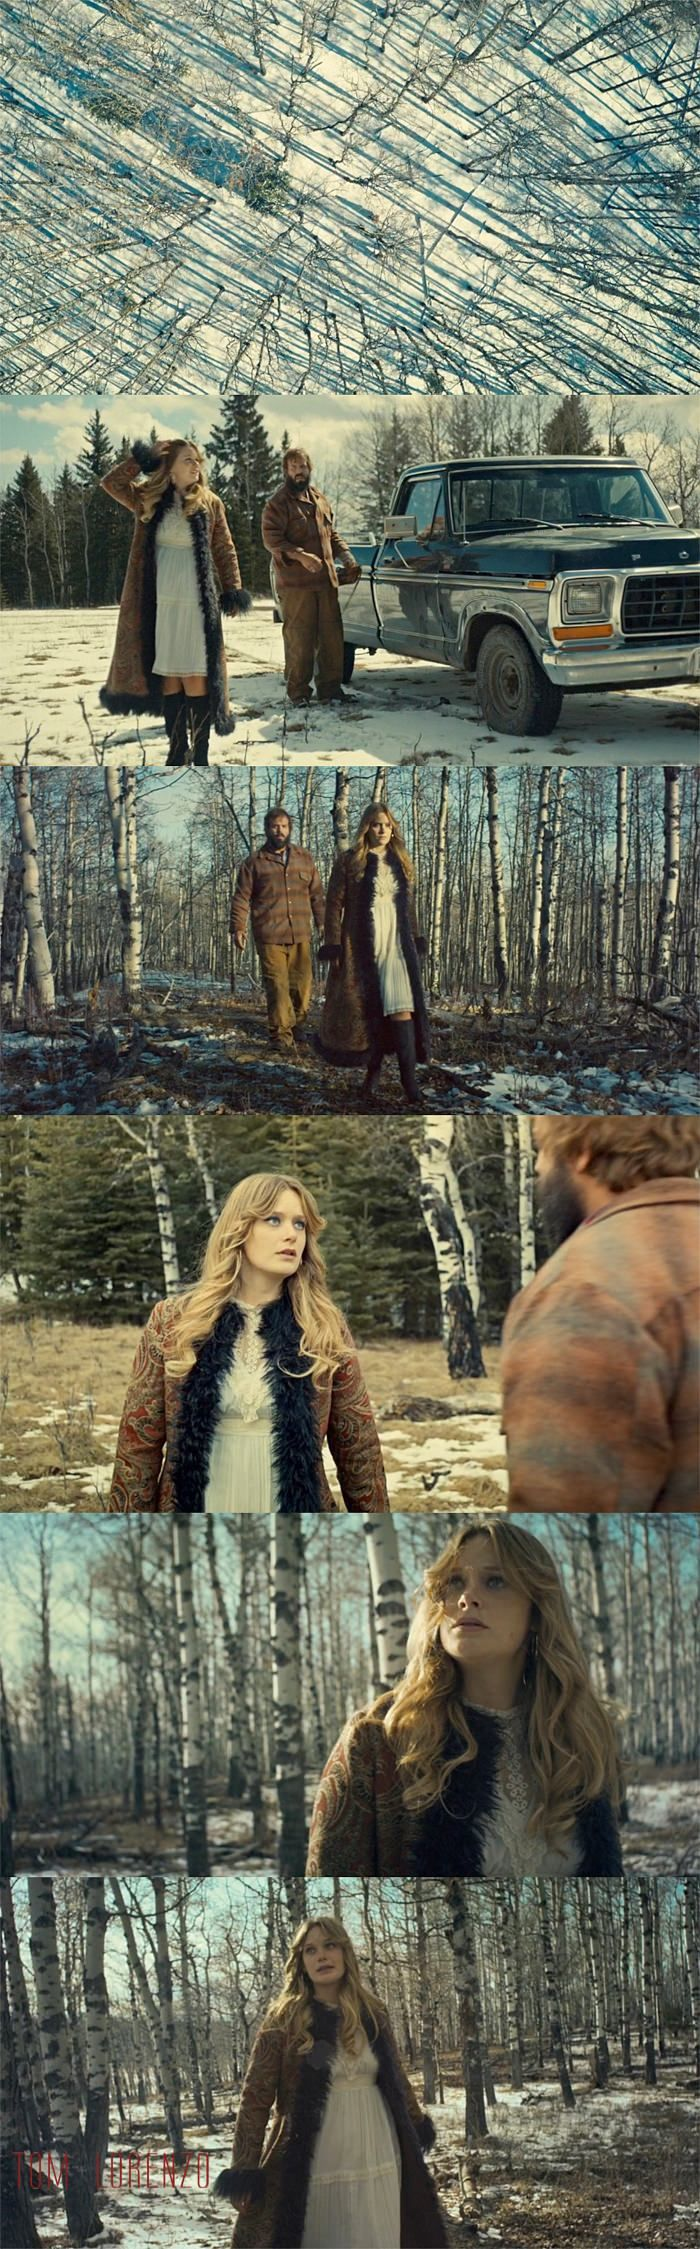 Fargo-Style-Season-2-Episode-7-Costumes-TV-Show-FX-Tom-Lorenzo-Site (9)